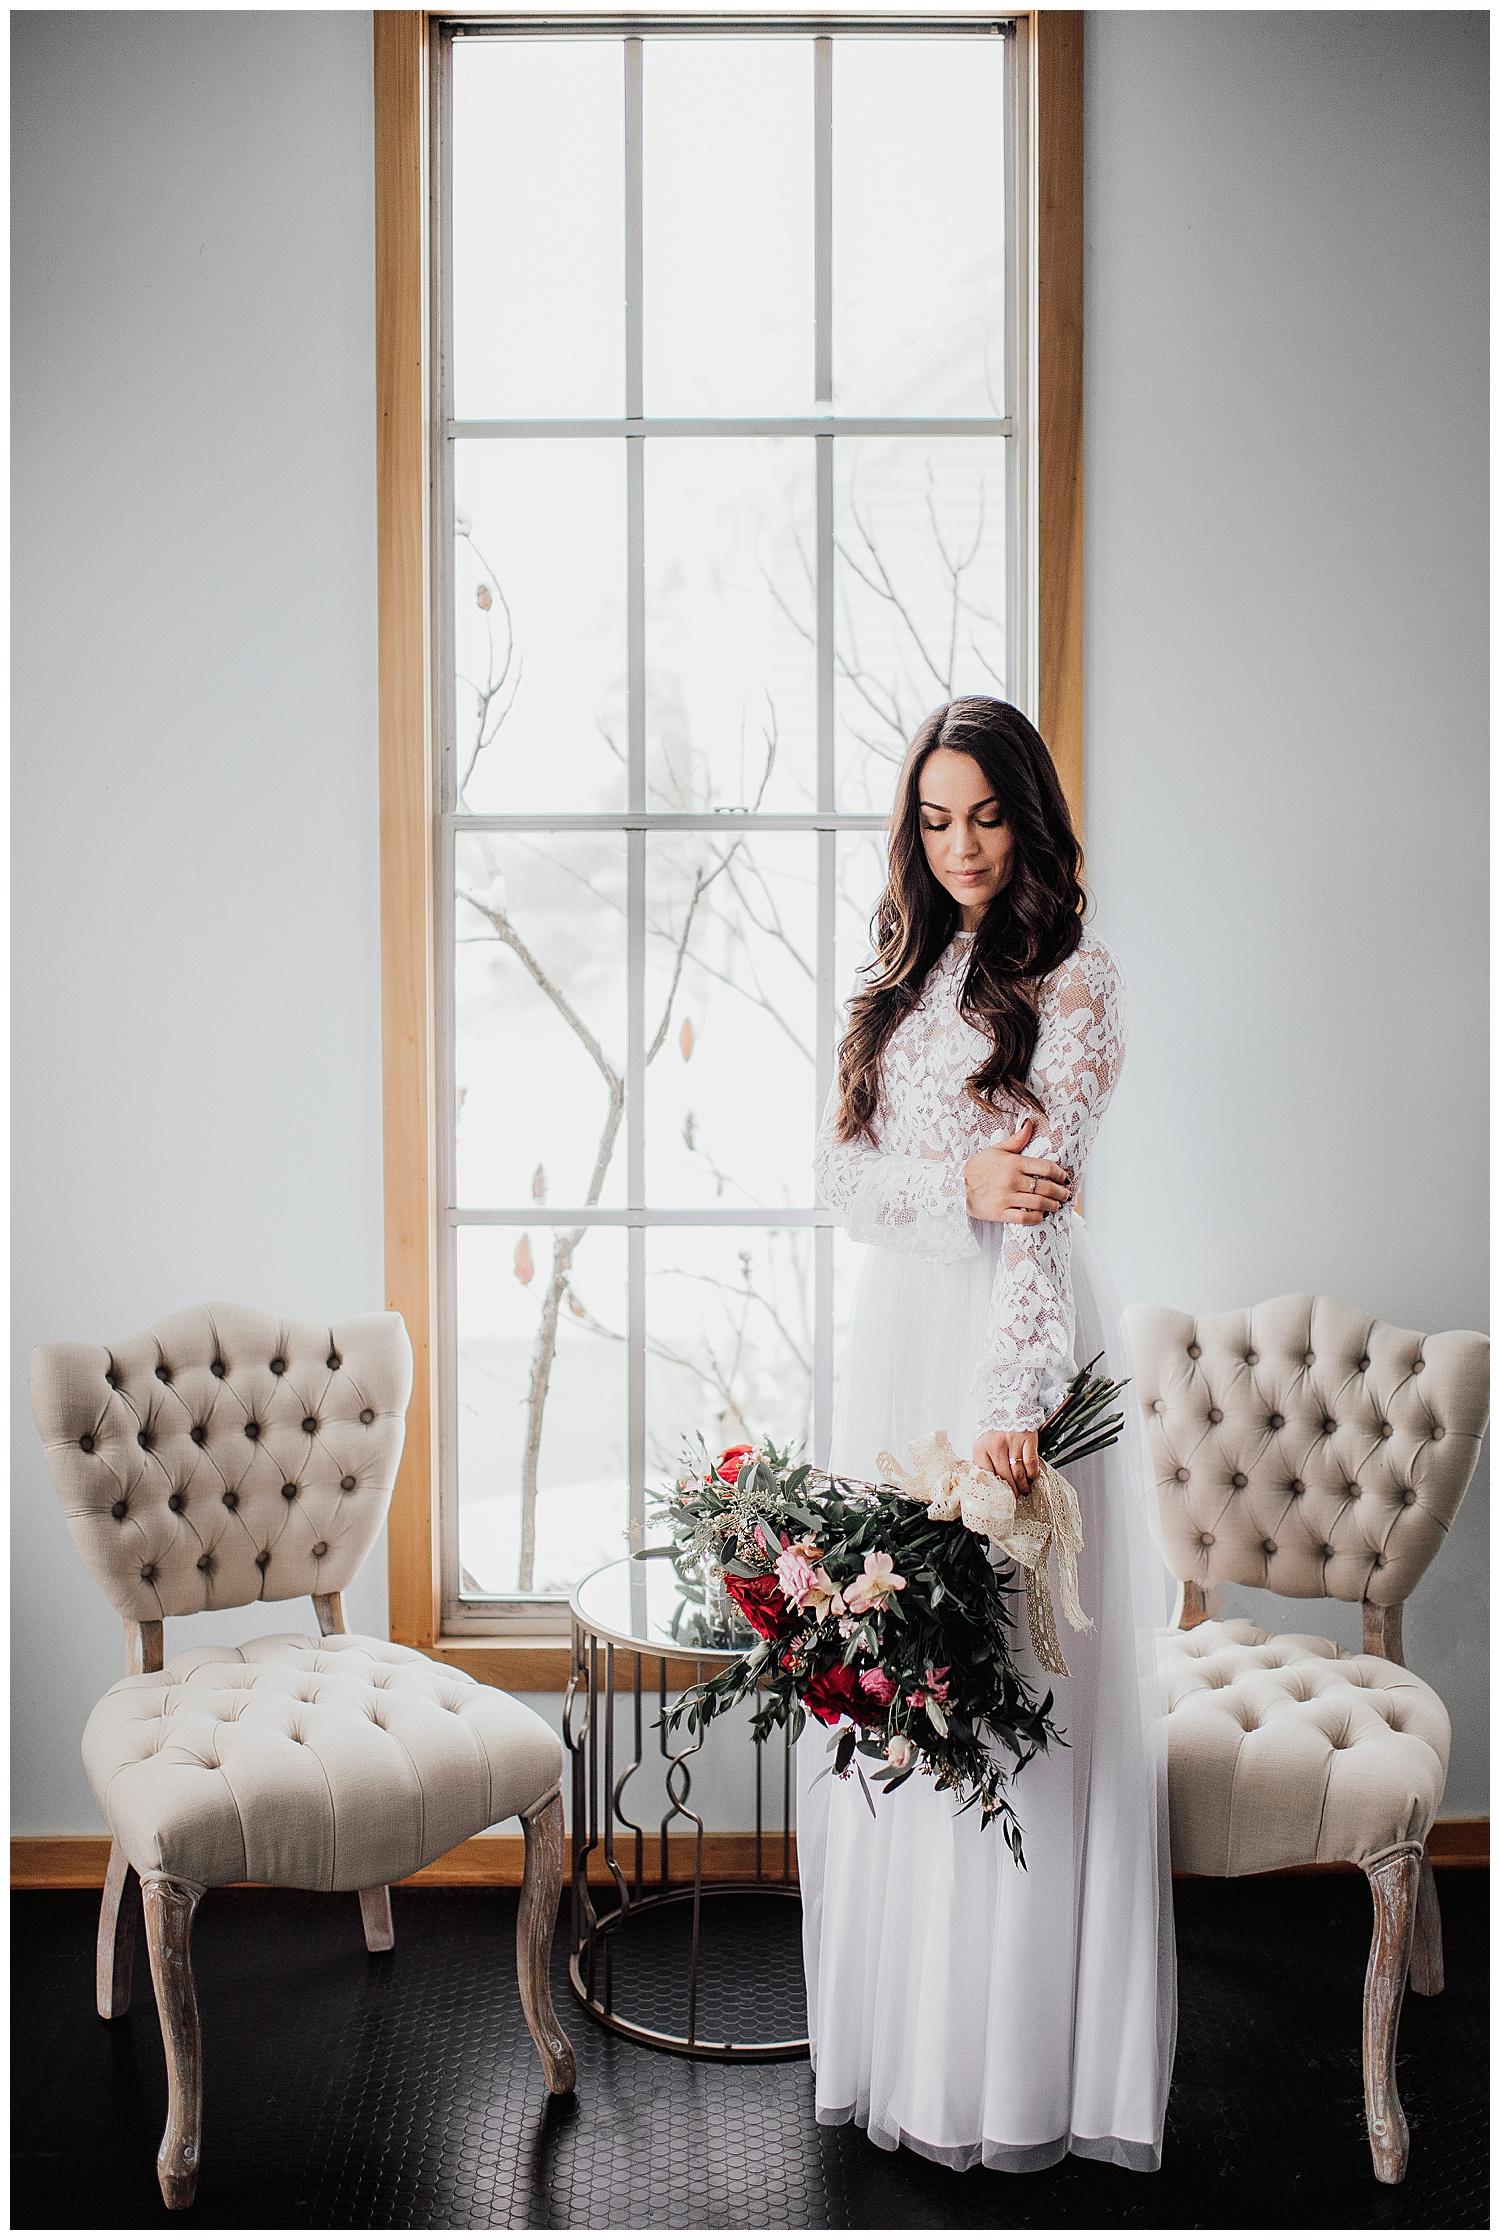 Valentines Day Wedding Inspiration | Upstate New York Wedding Inspiration | Syracuse, NY | www.redoakweddings.com